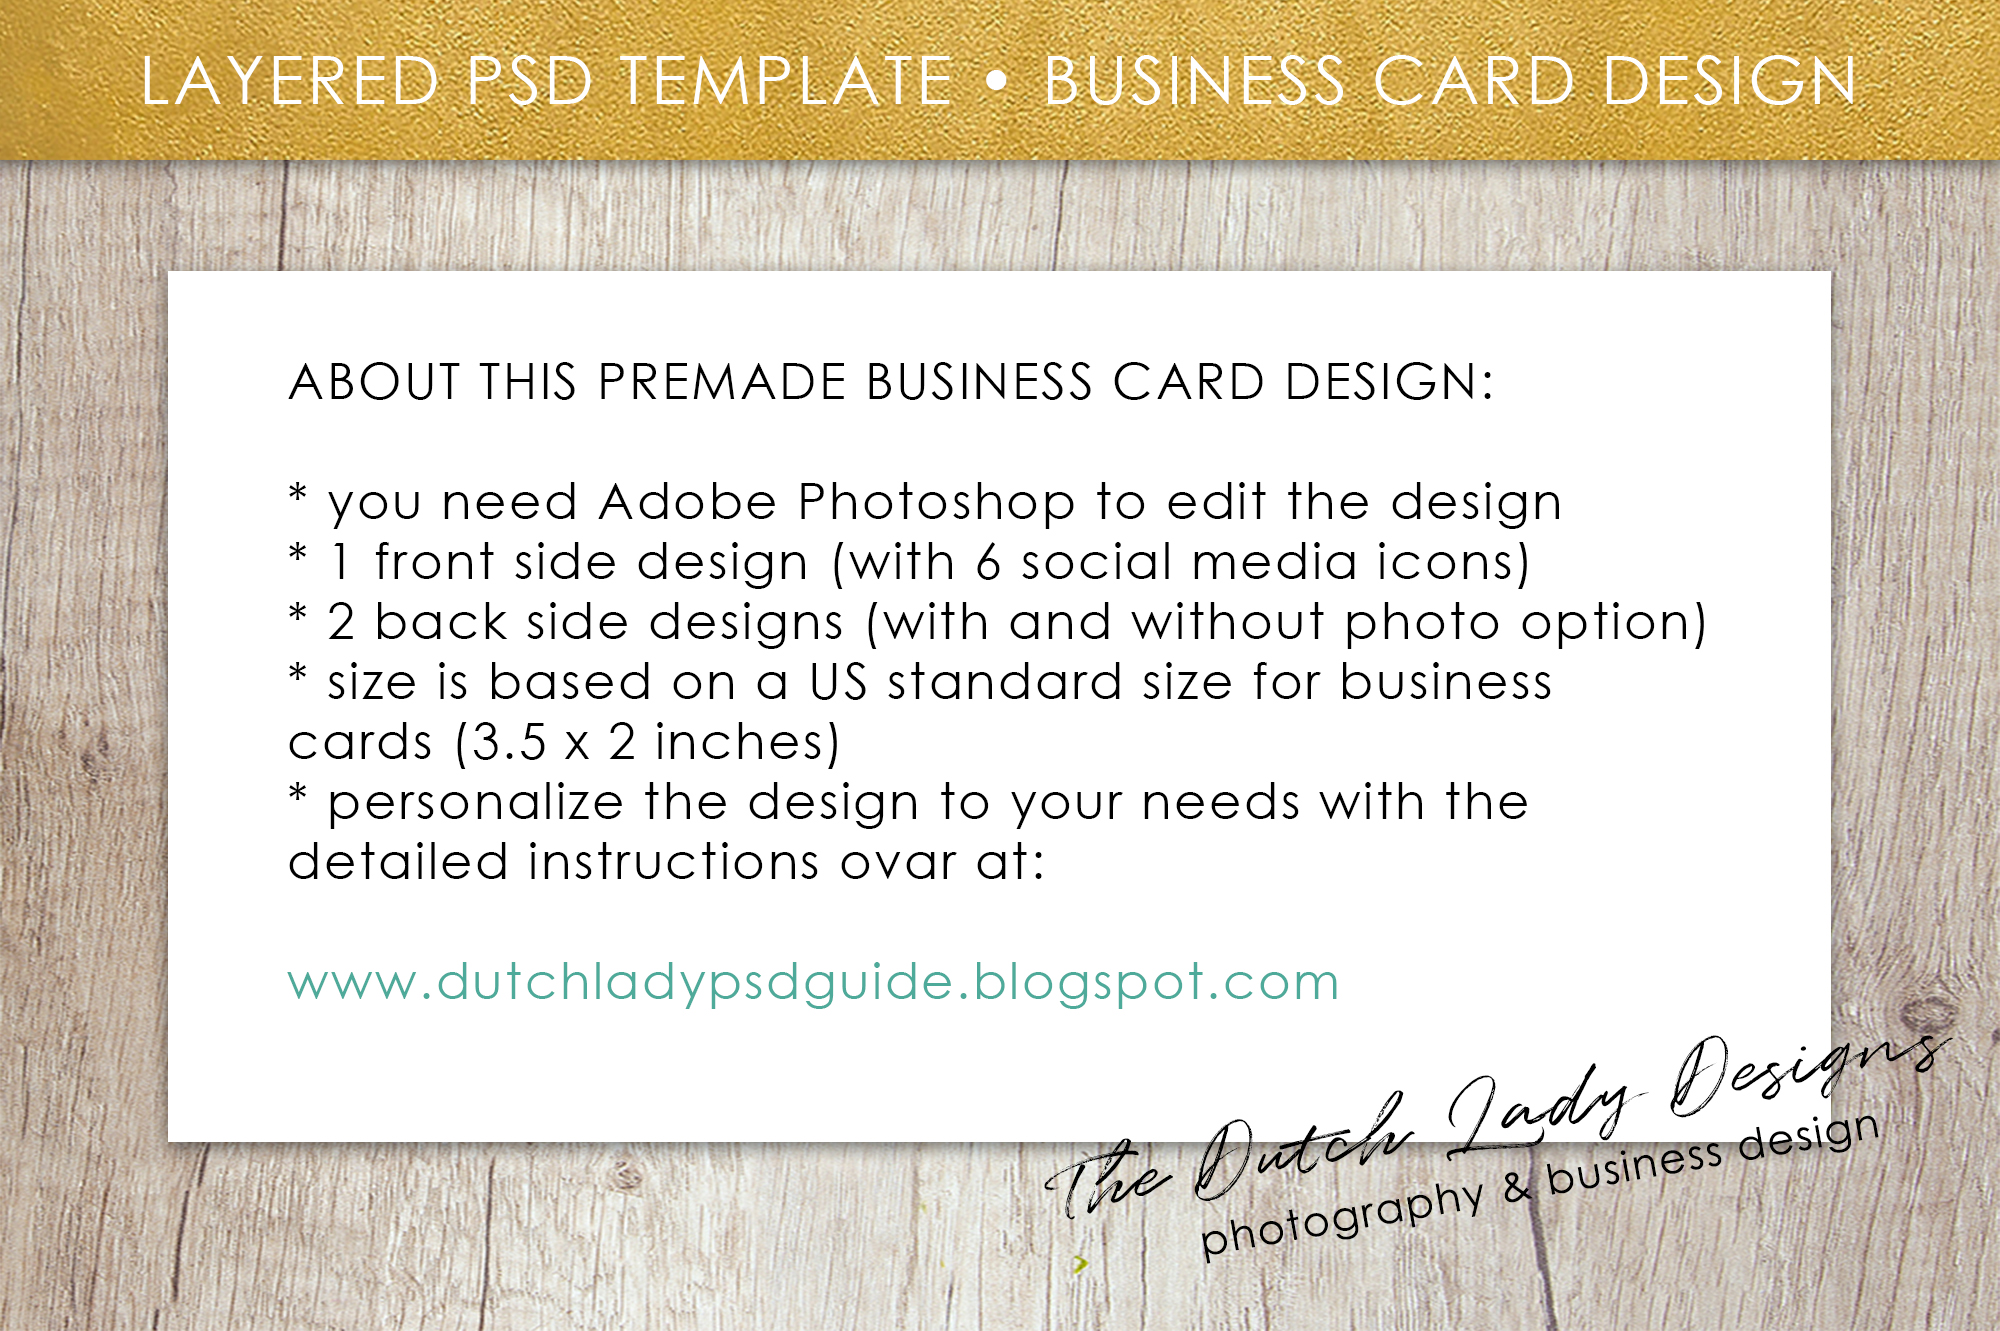 Business Card Template for Adobe Photos | Design Bundles